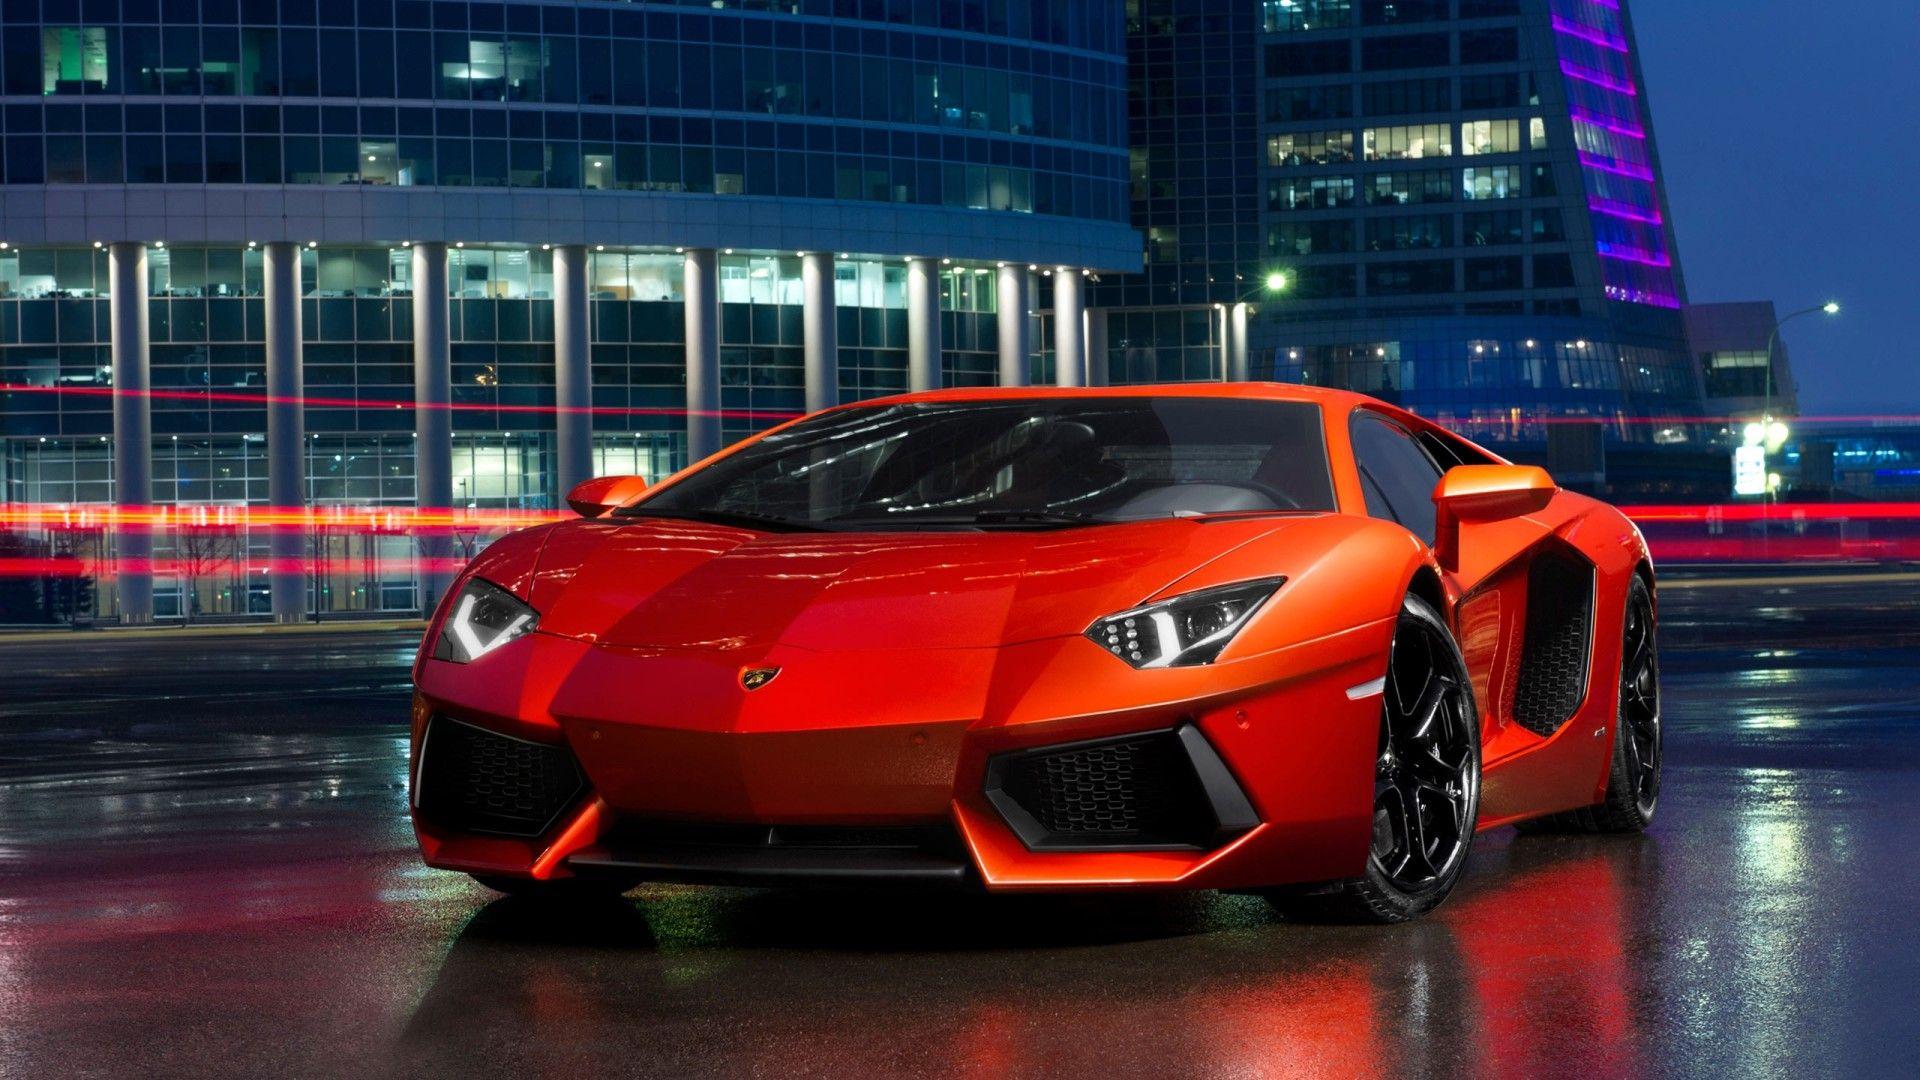 Cool Car Wallpaper High Definition #Hyf | Cars in 2019 | Lamborghini aventador lp700 ...